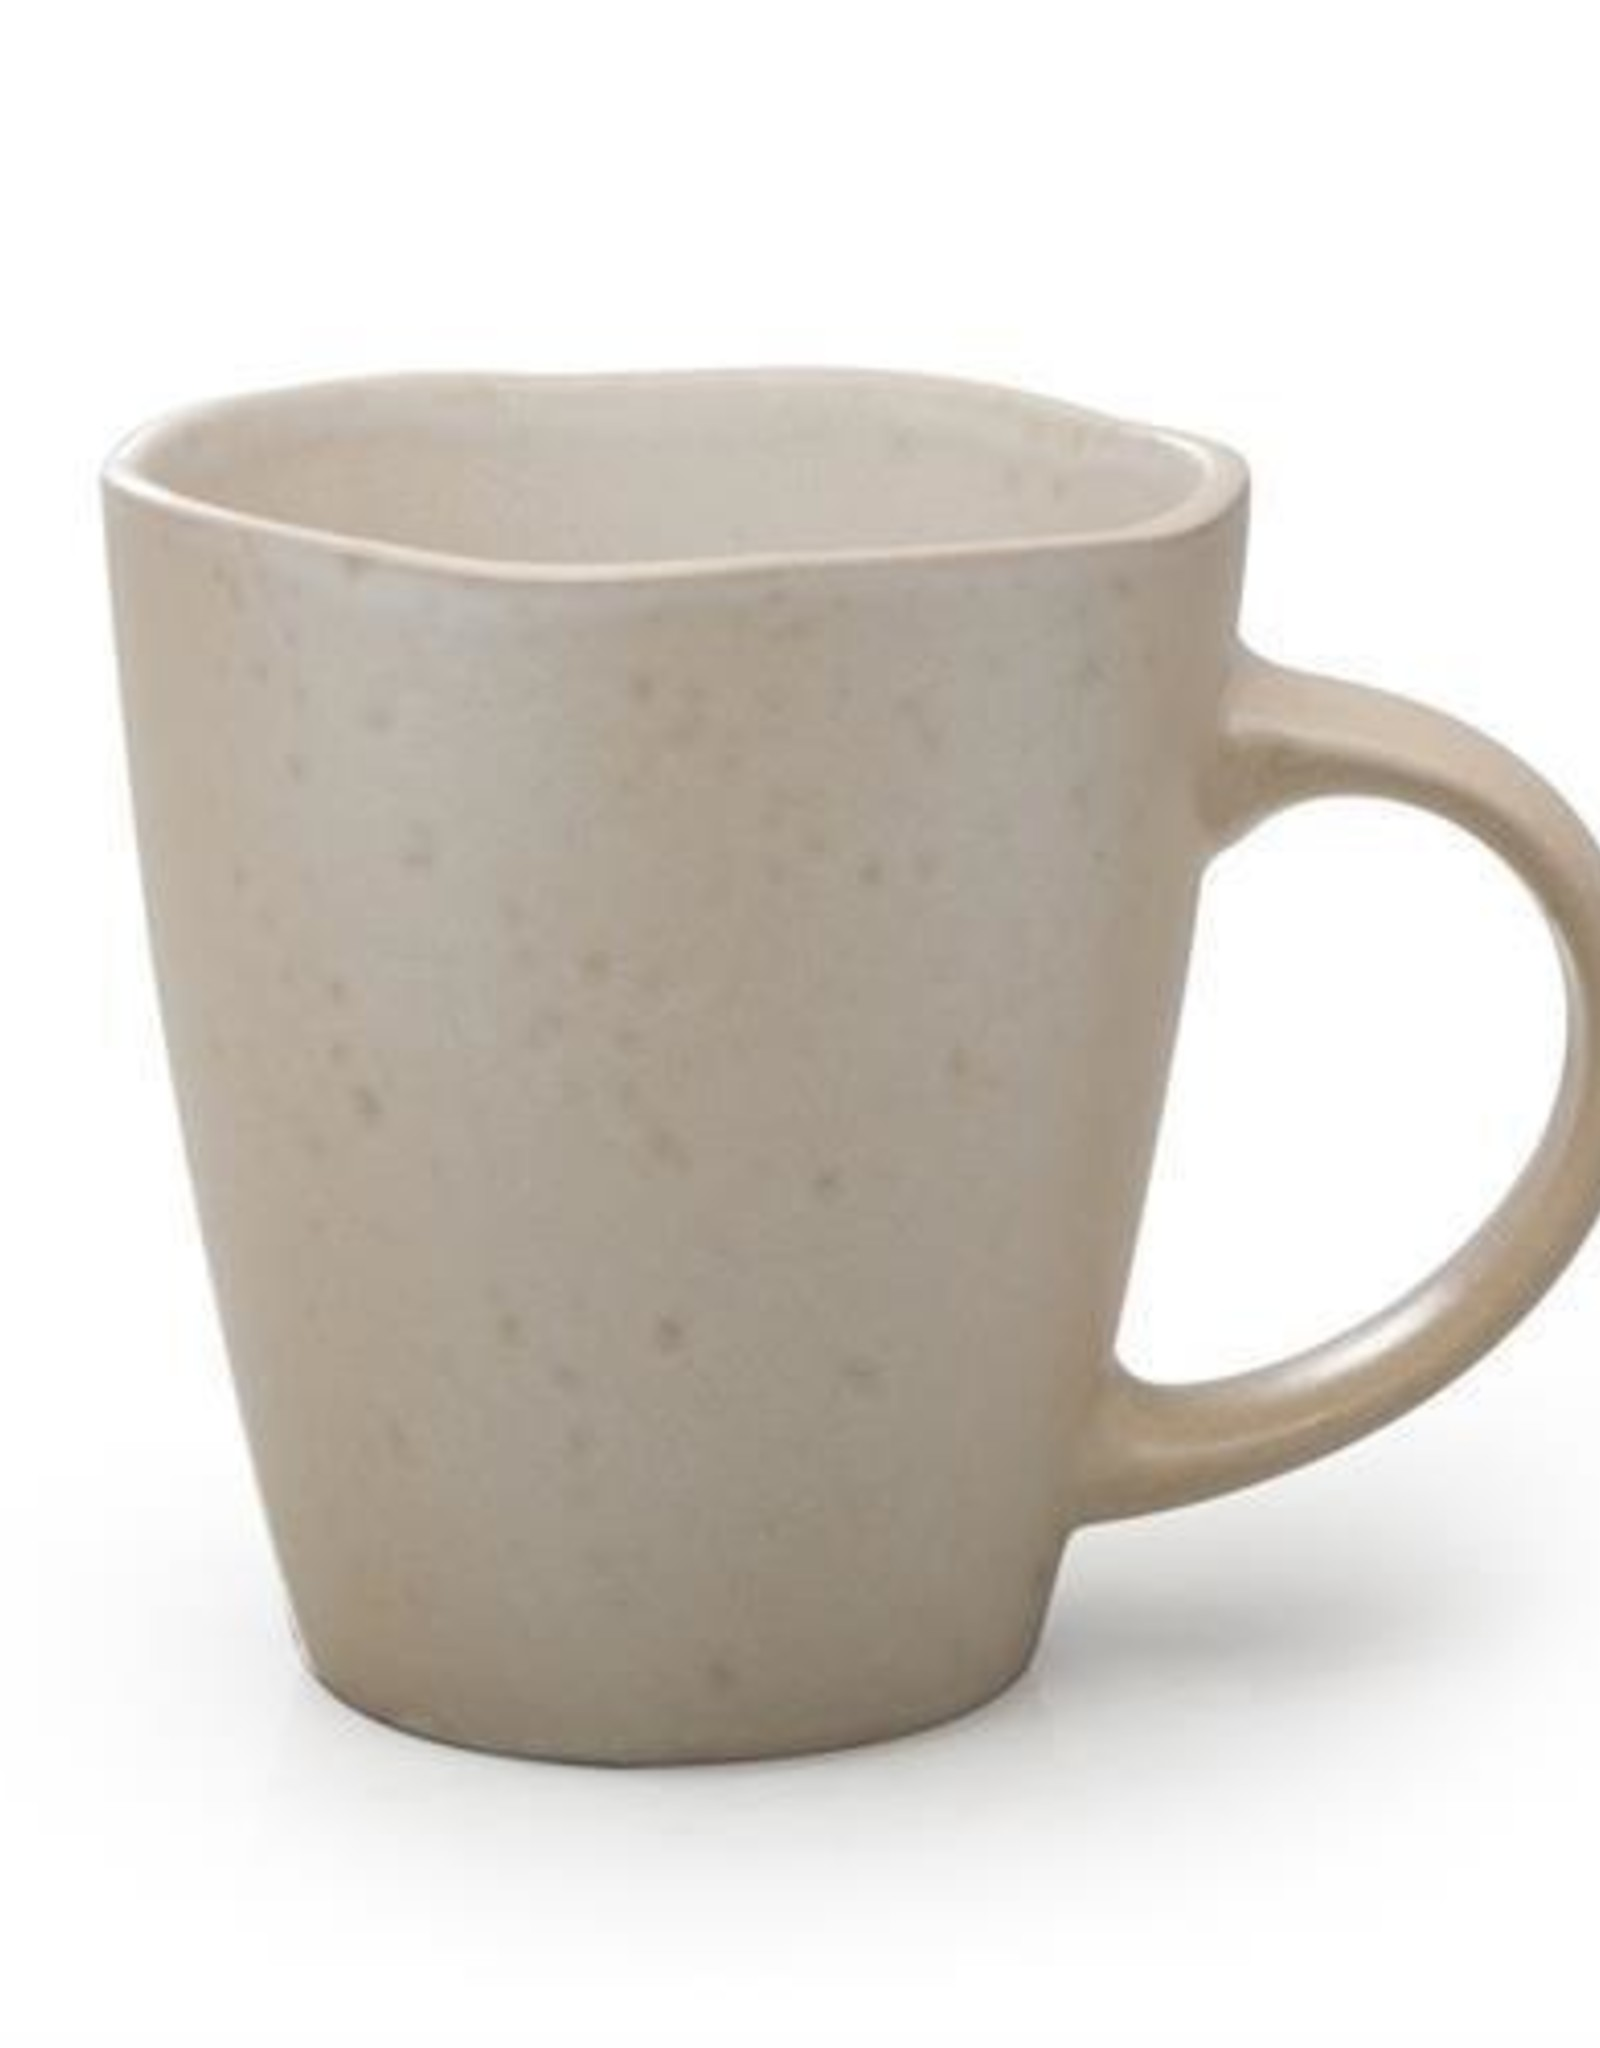 Bia Organic Mug, 12oz White